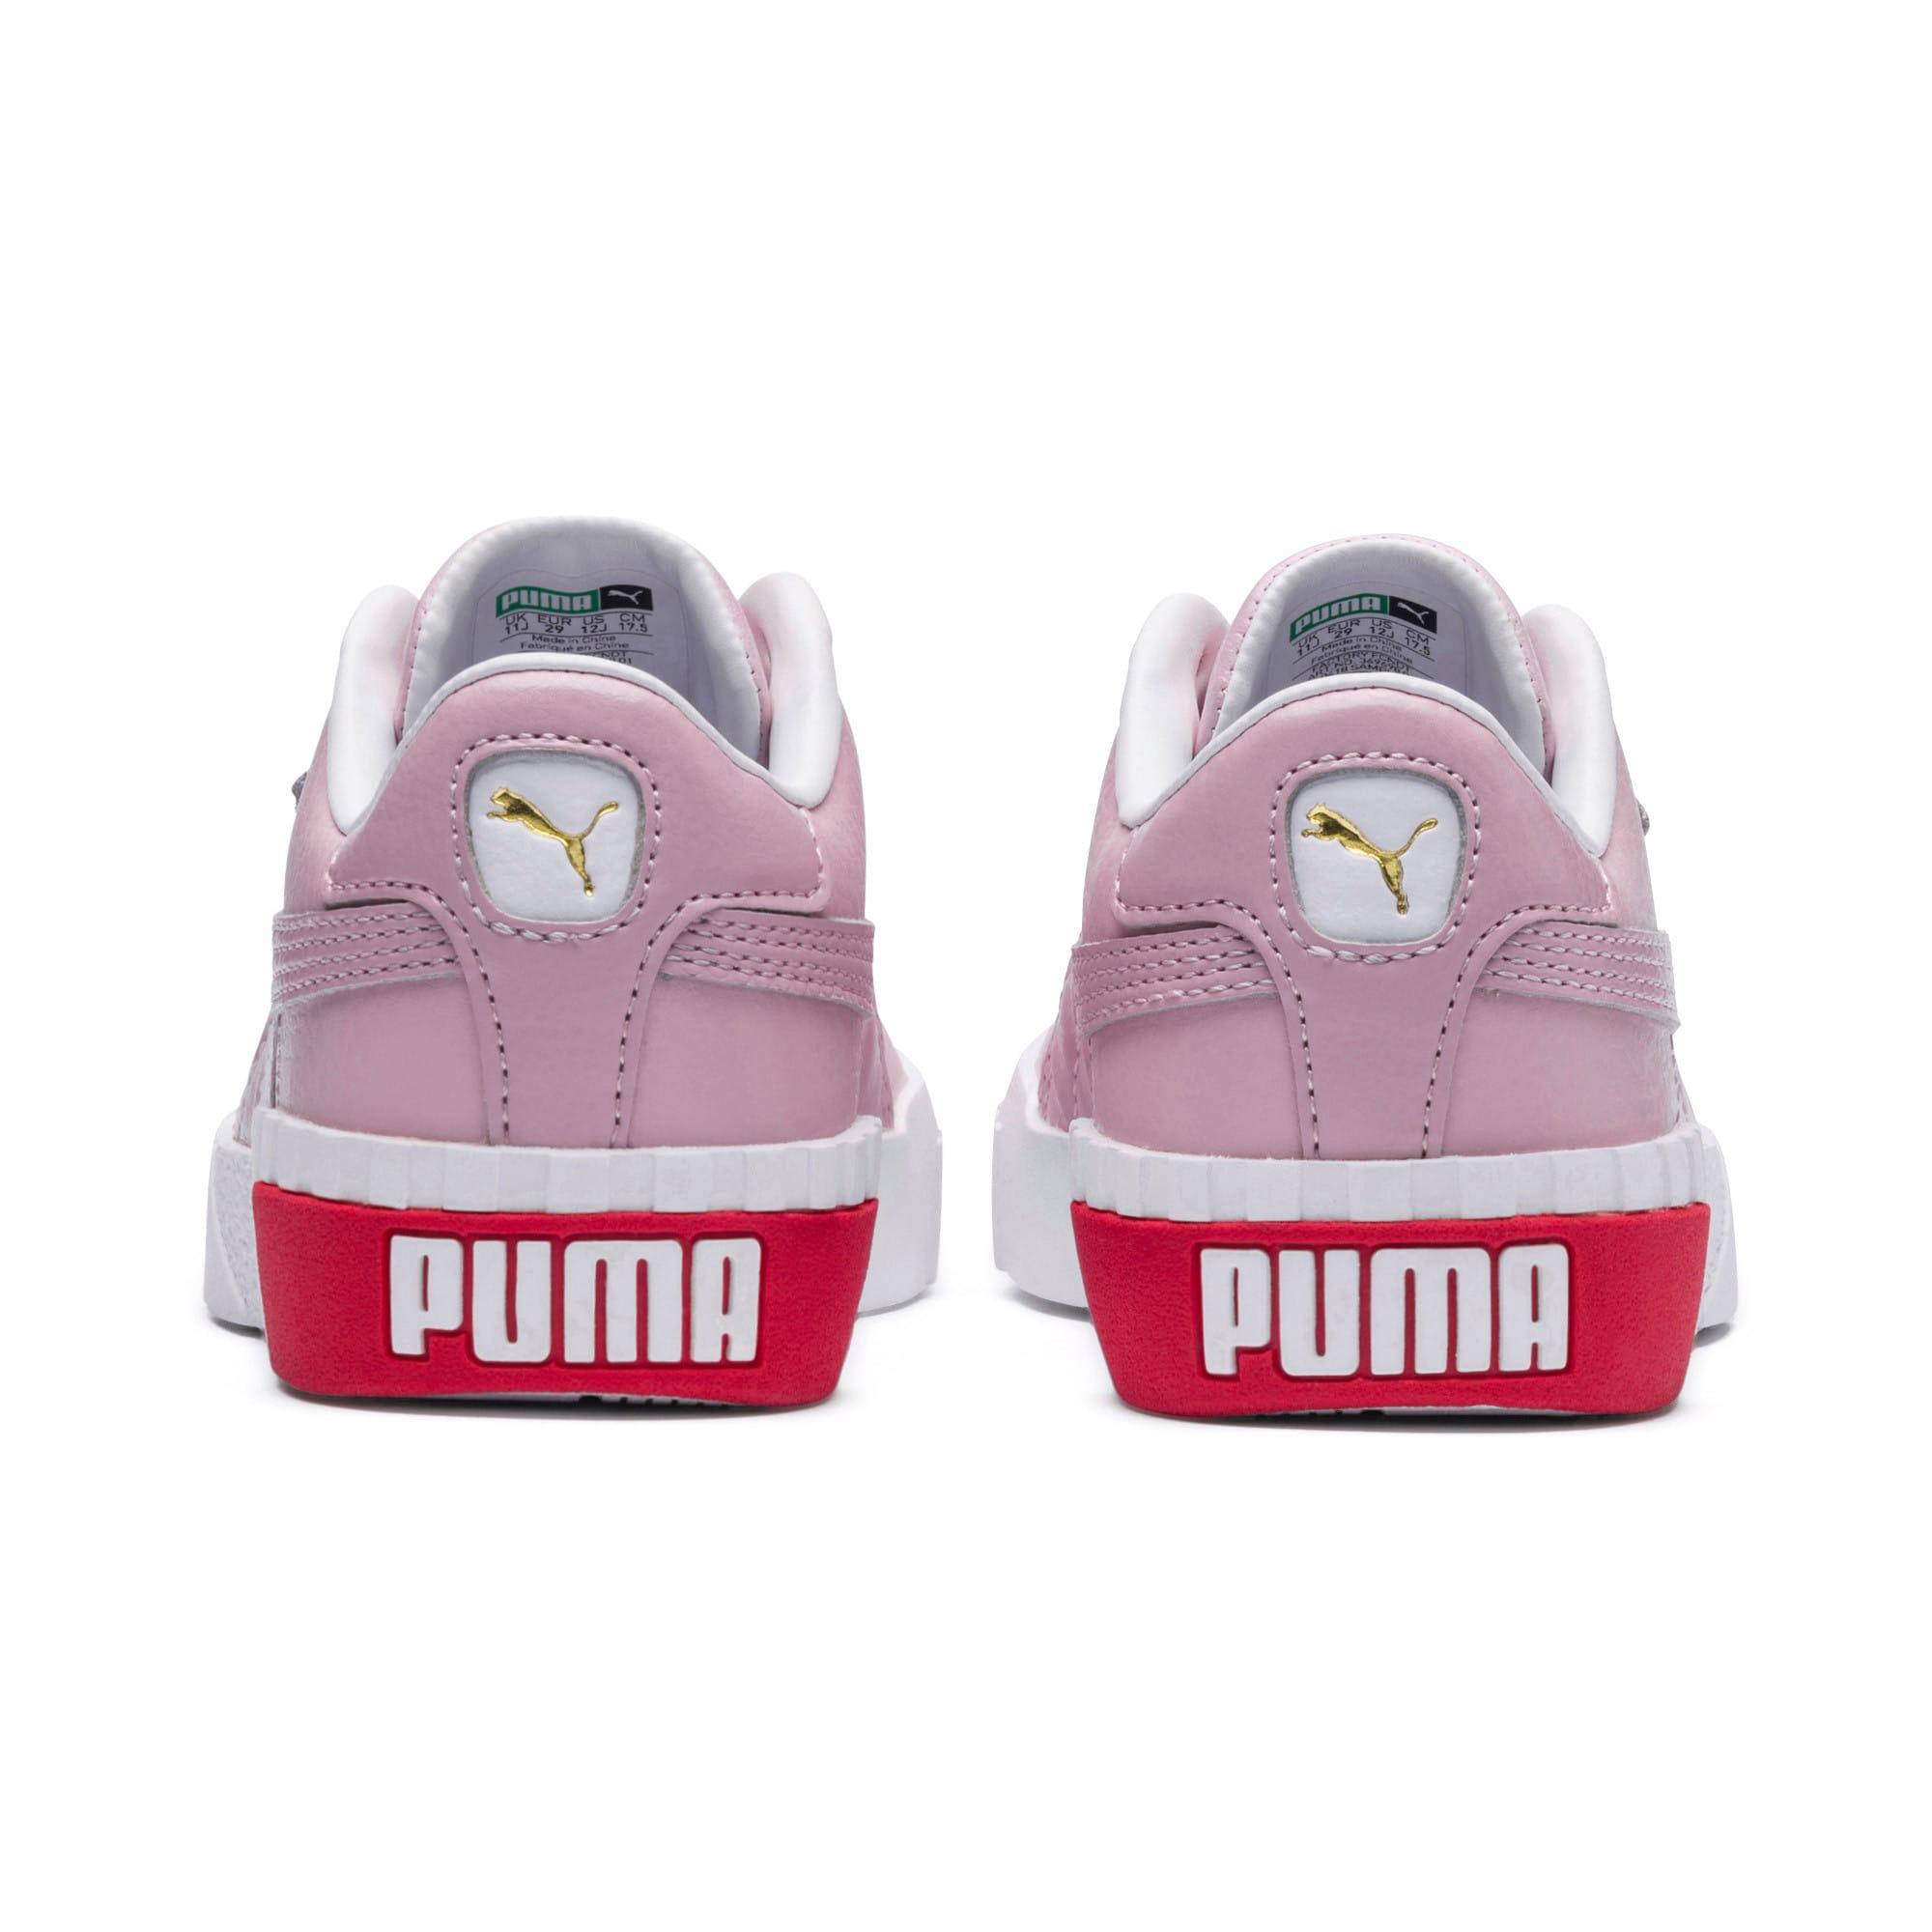 Thumbnail 3 of Cali sneakers voor meisjes, Puma White-Hibiscus, medium